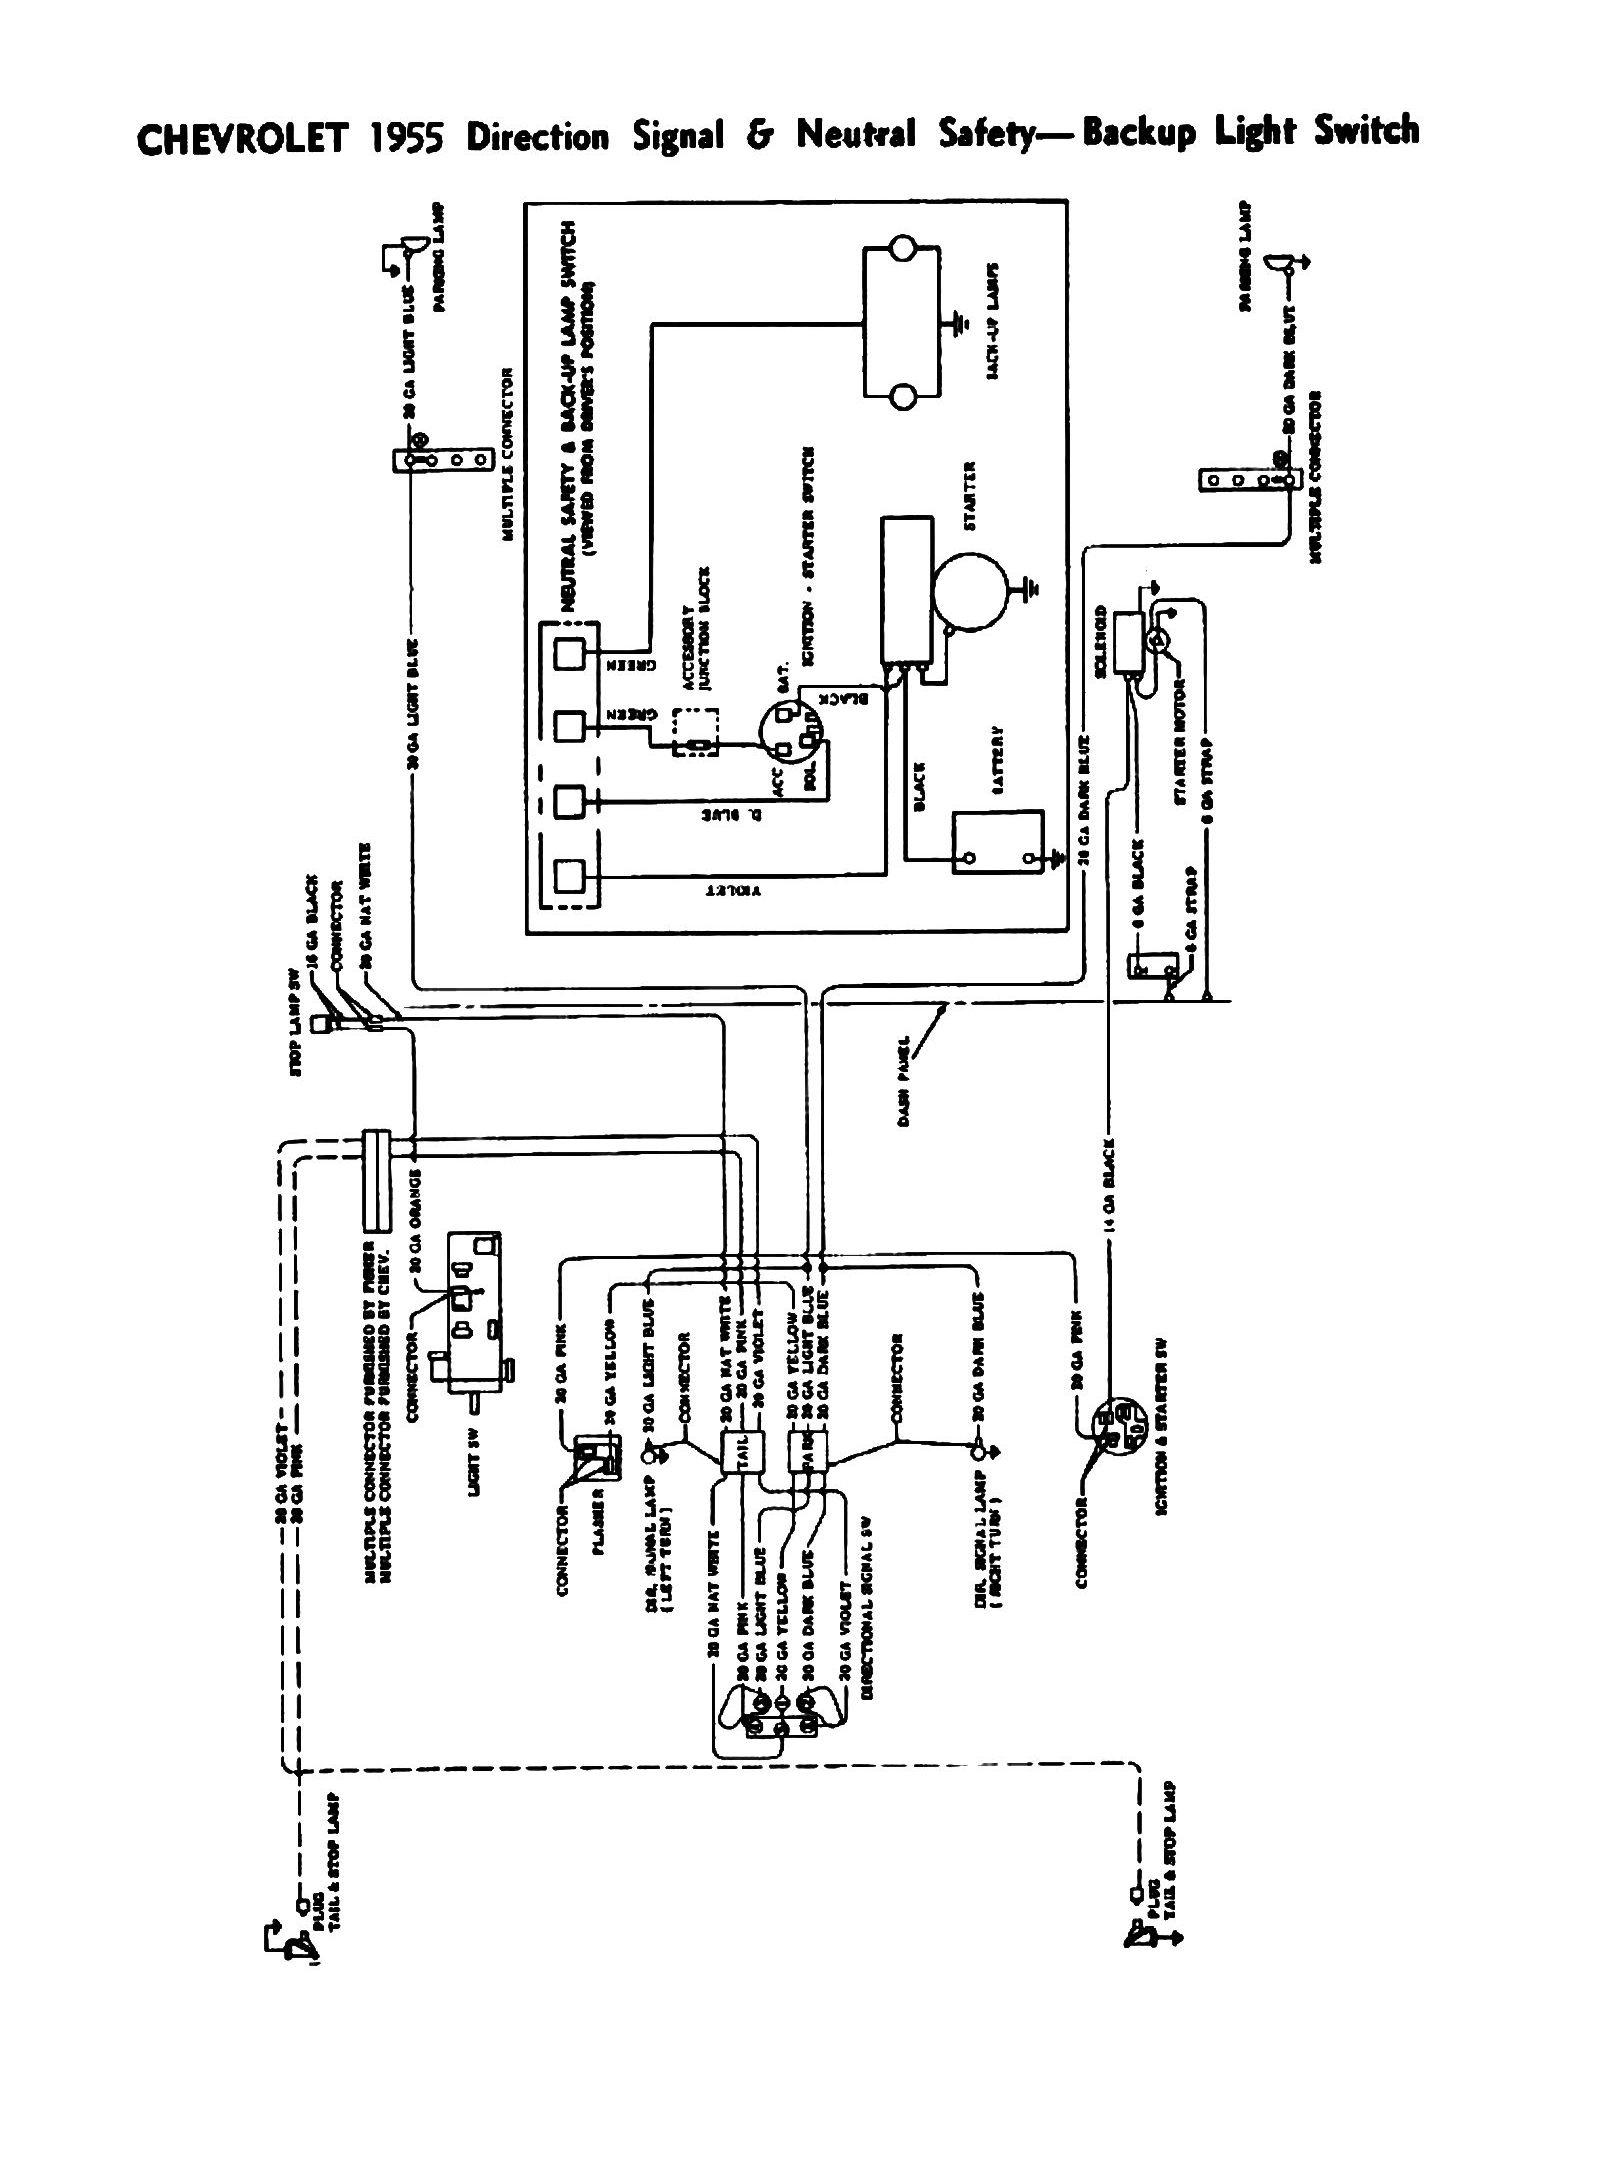 Remarkable 1956 Gmc Wiring Diagram Wiring Diagram Data Wiring Cloud Hemtshollocom